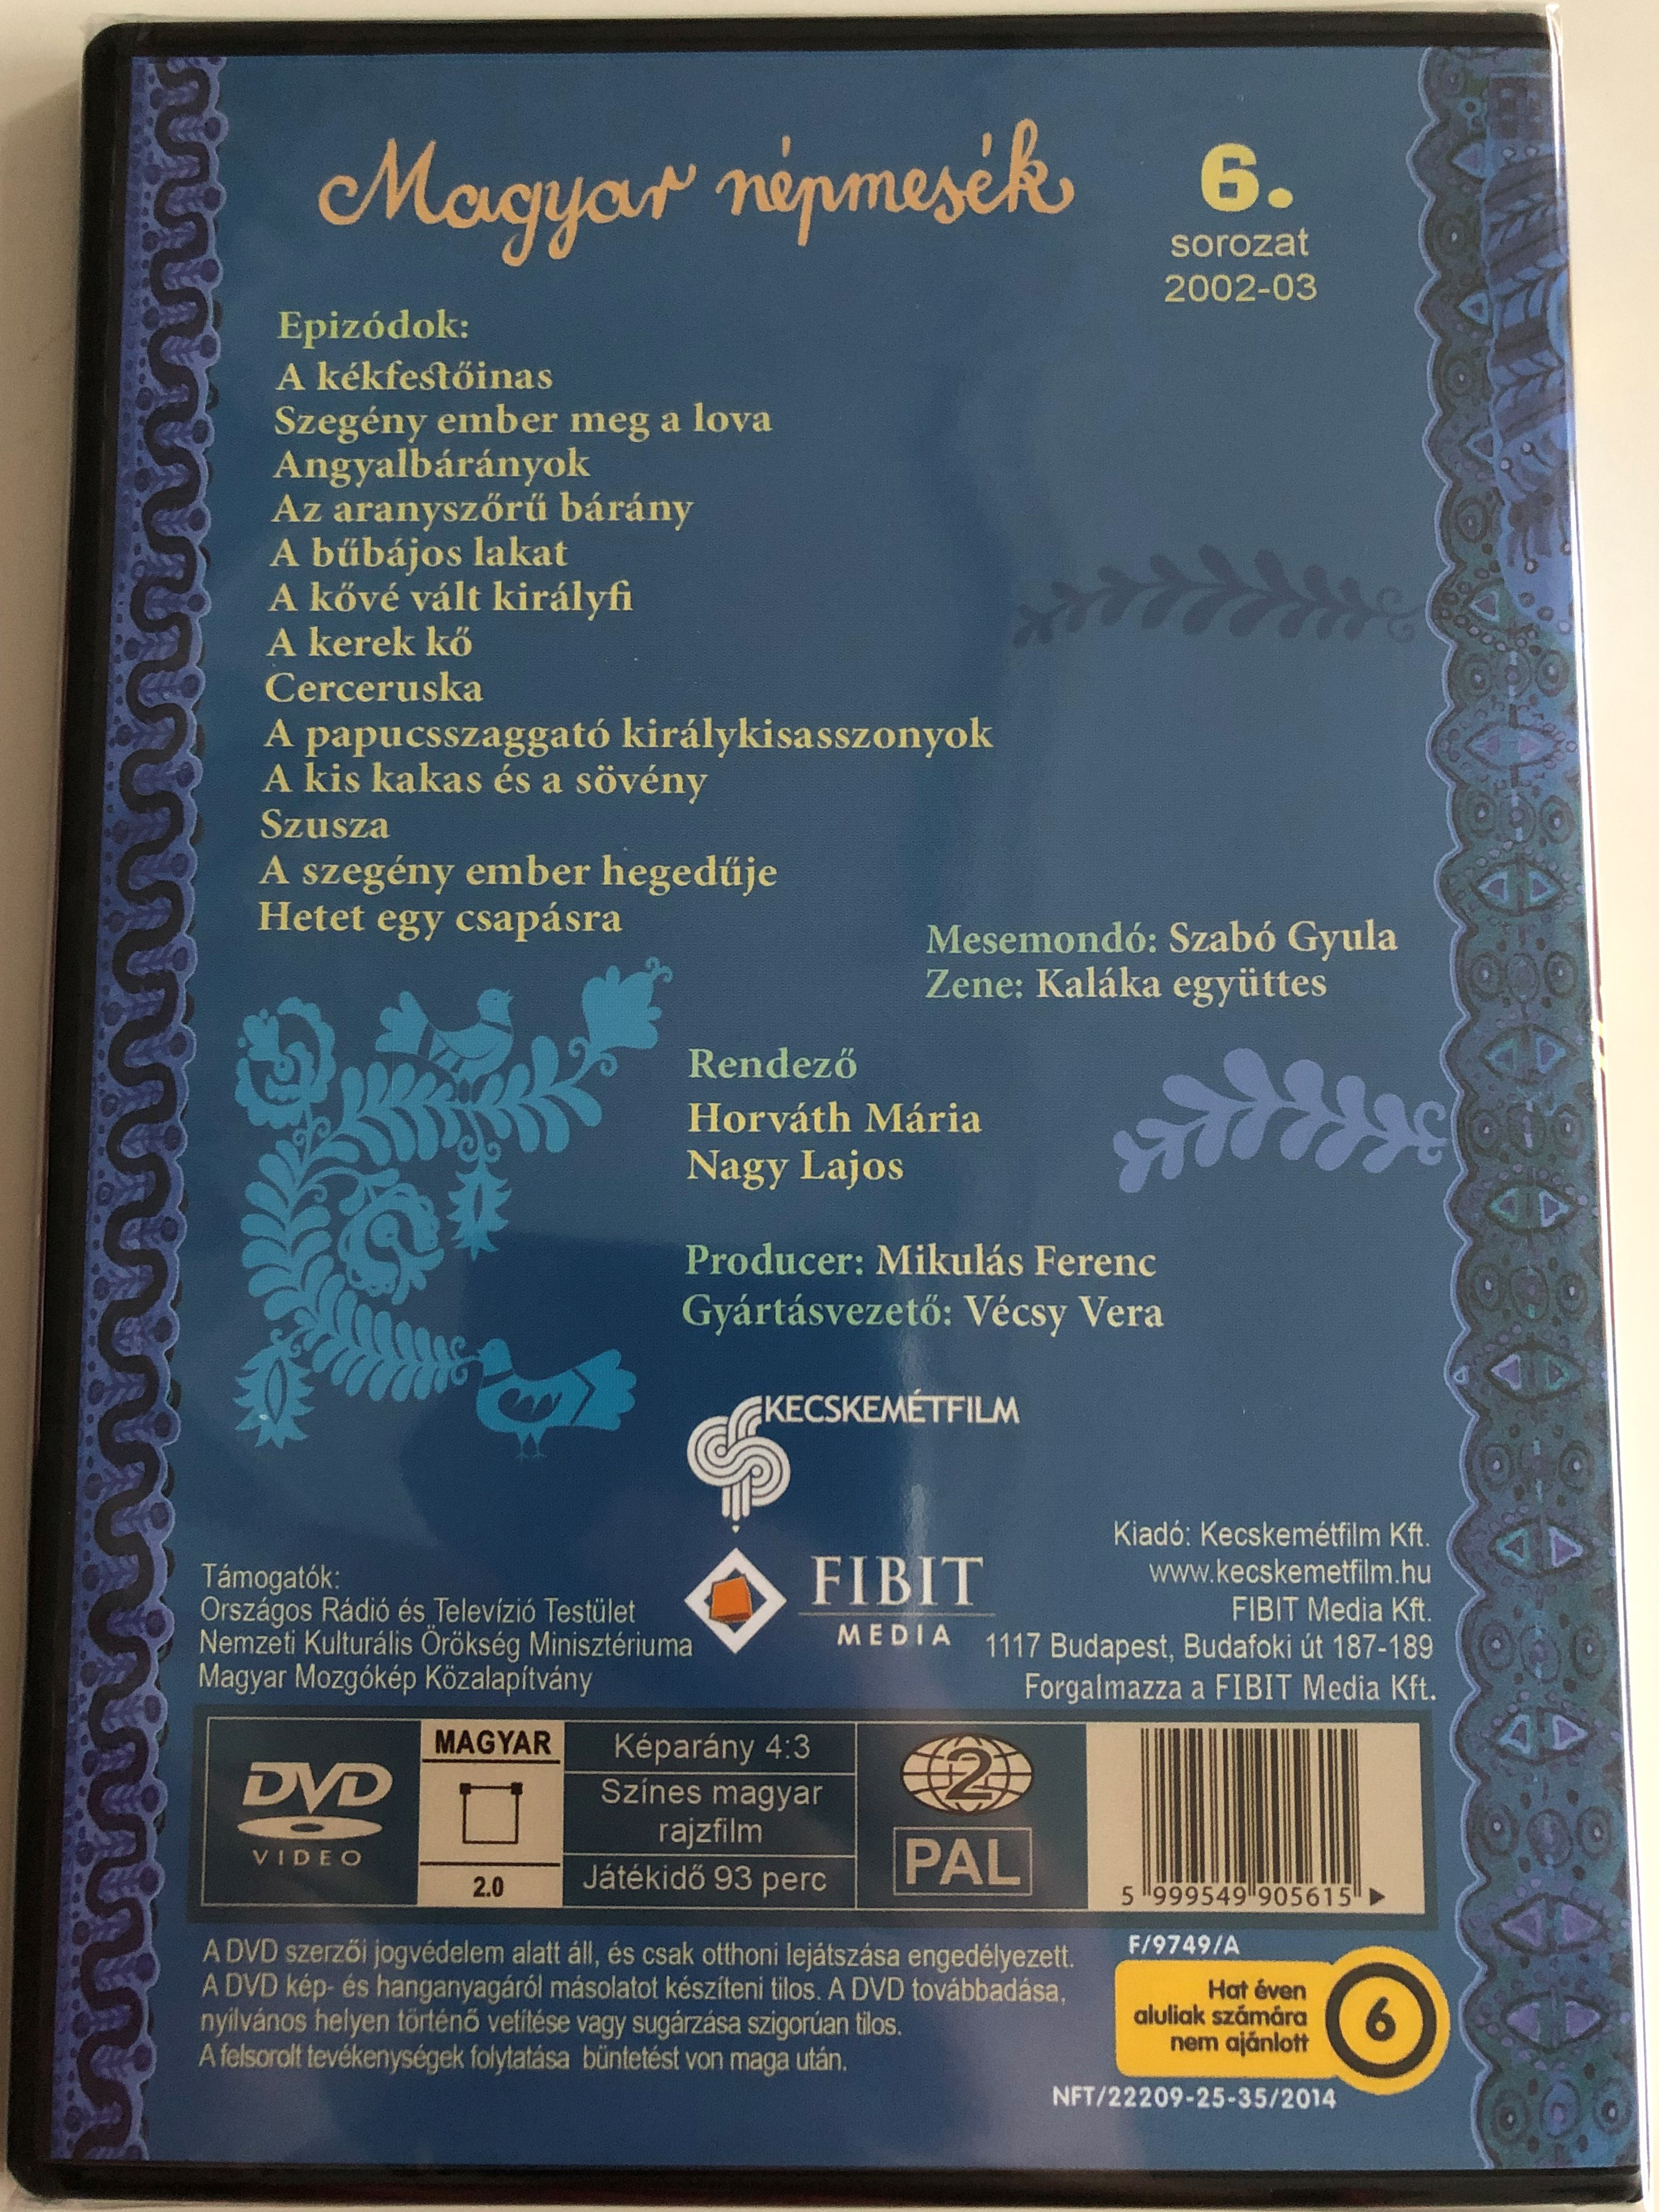 magyar-n-pmes-k-6.-a-k-kpest-inas-dvd-2002-2003-hungarian-folk-tales-for-children-directed-by-horv-th-m-ria-nagy-j-zsef-read-by-szab-gyula-2-.jpg